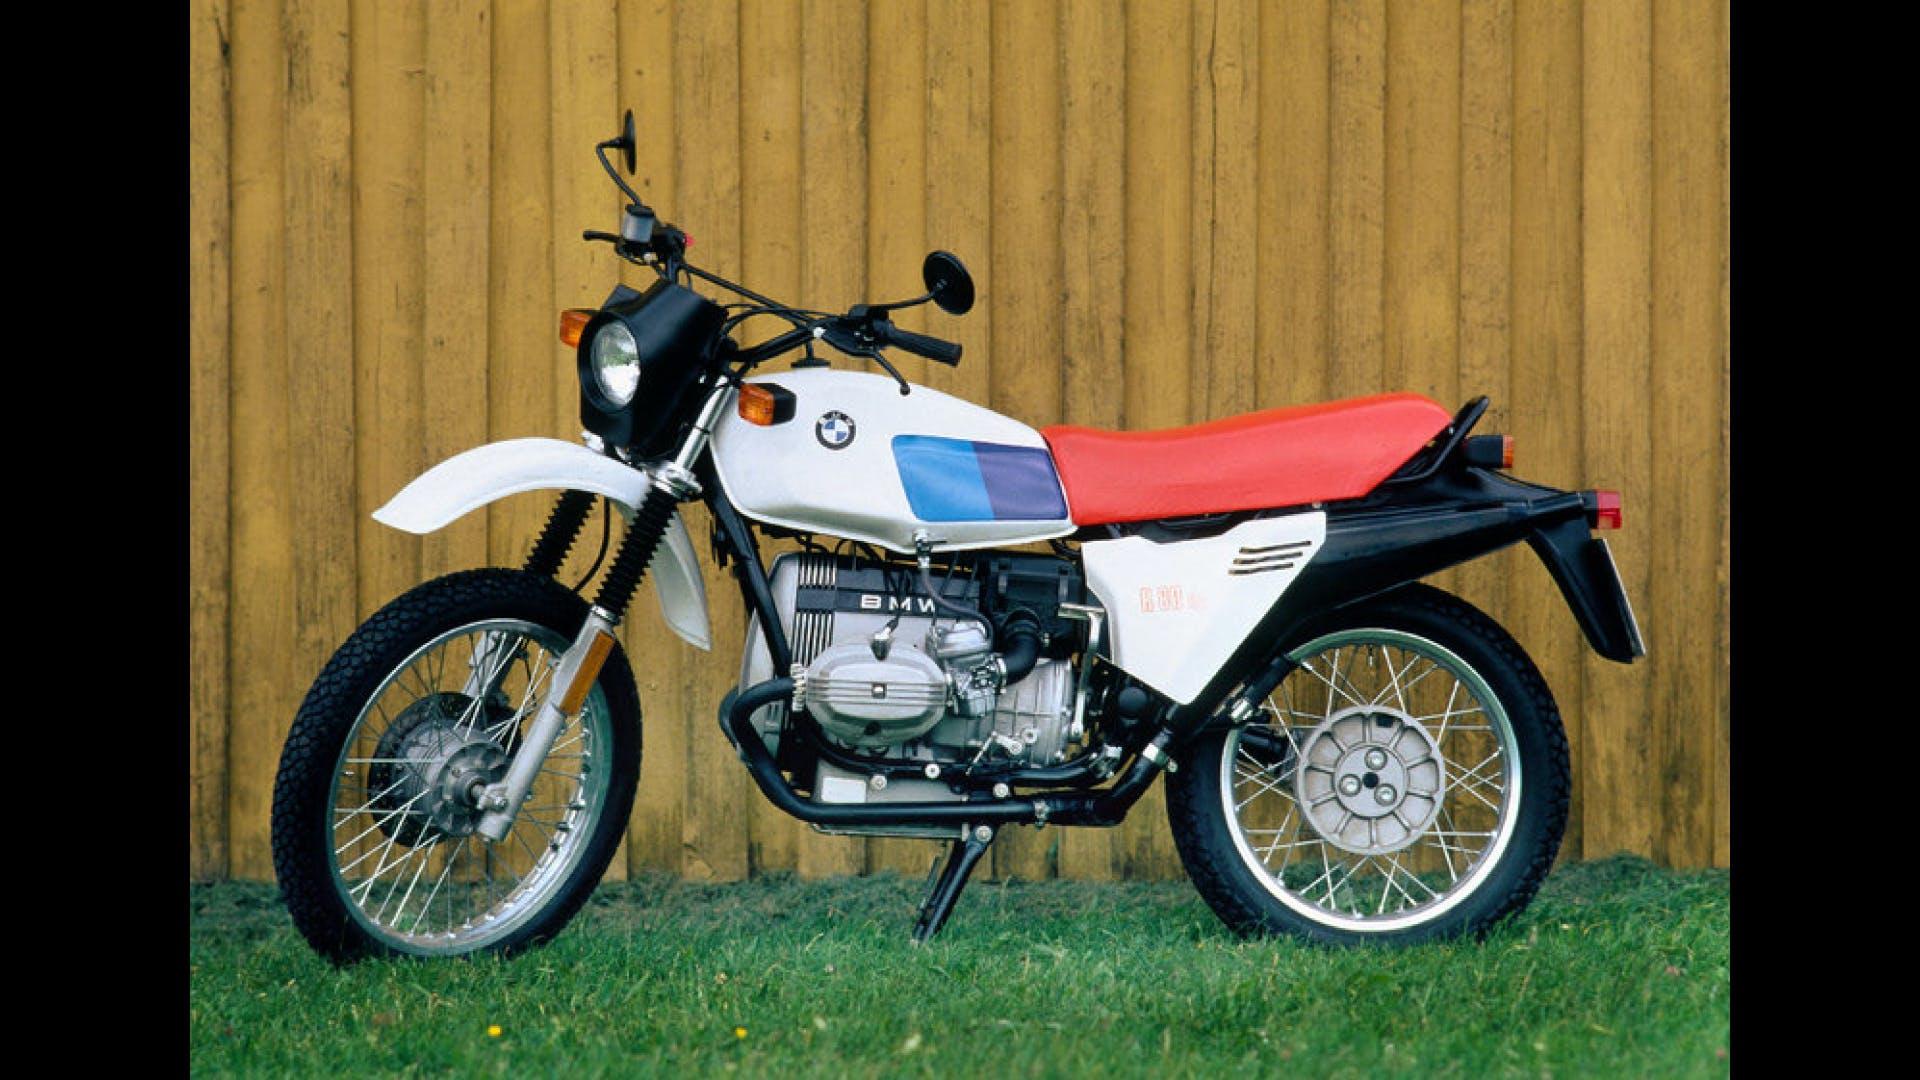 BMW R 800 G/S 1980